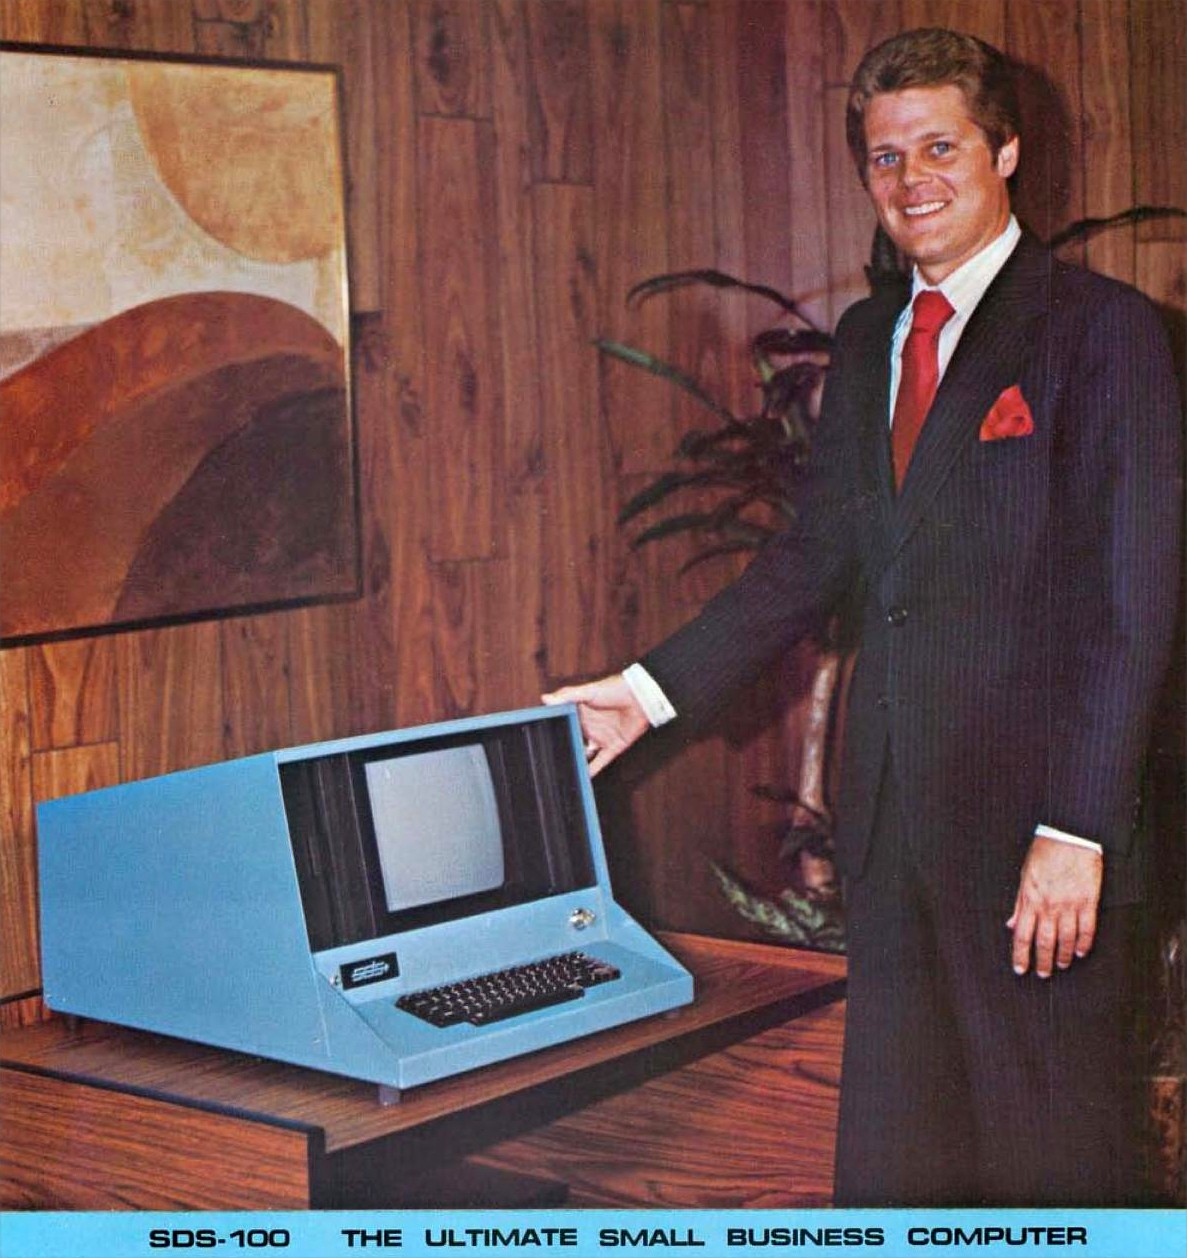 vintage-computer-ad.jpg